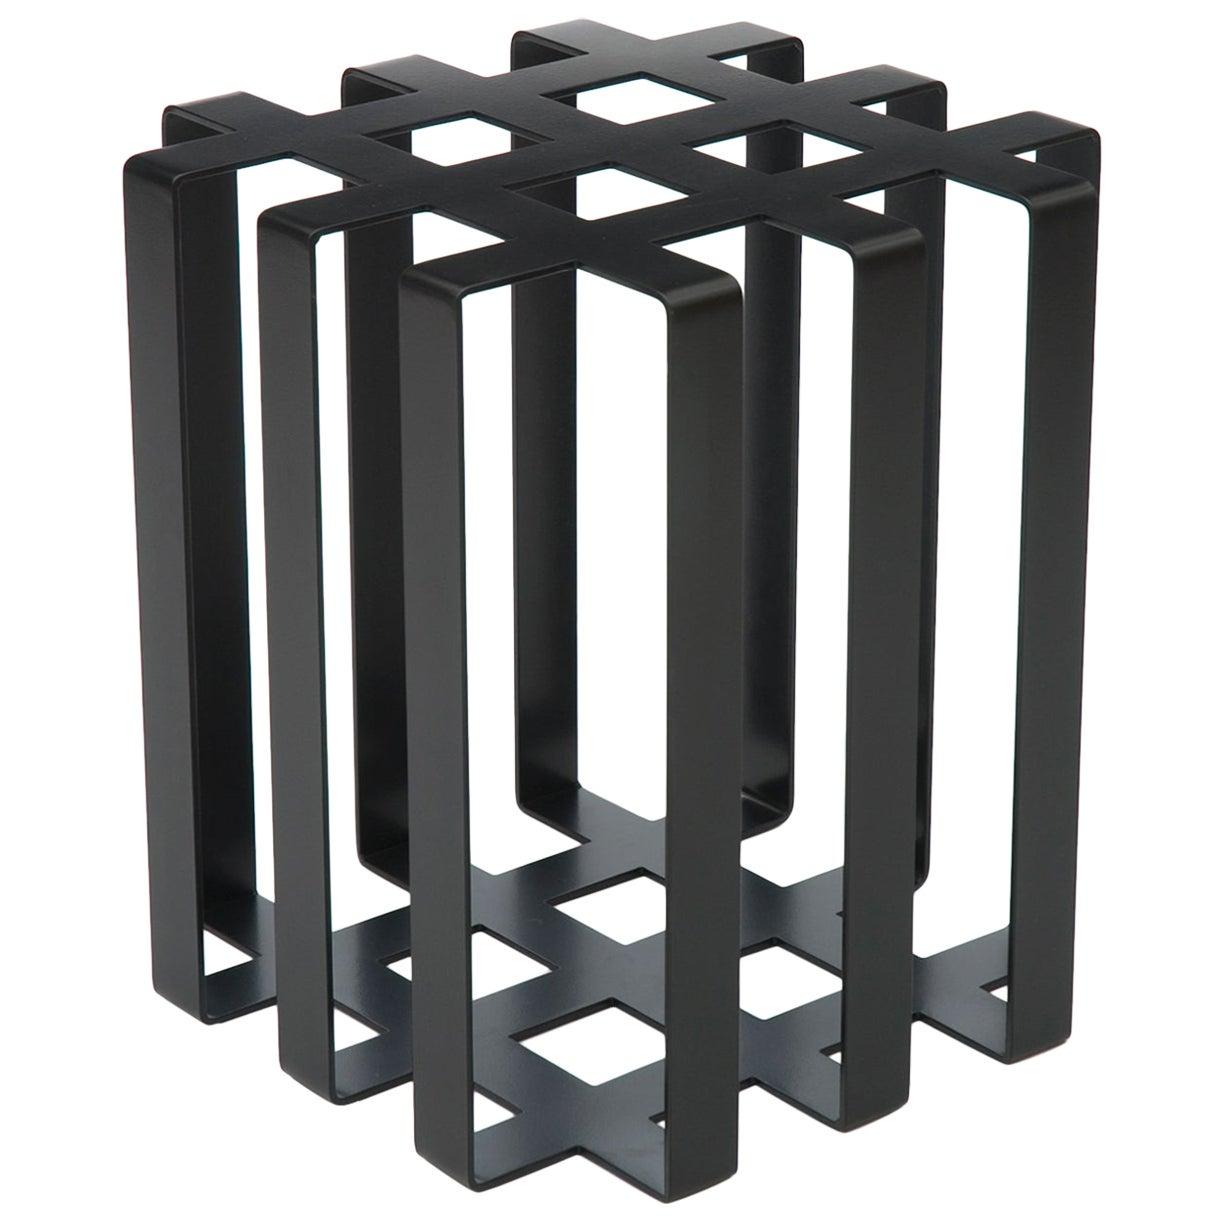 Ramen Geometric Modern Sculptural Side Table Black Powder-Coated Steel